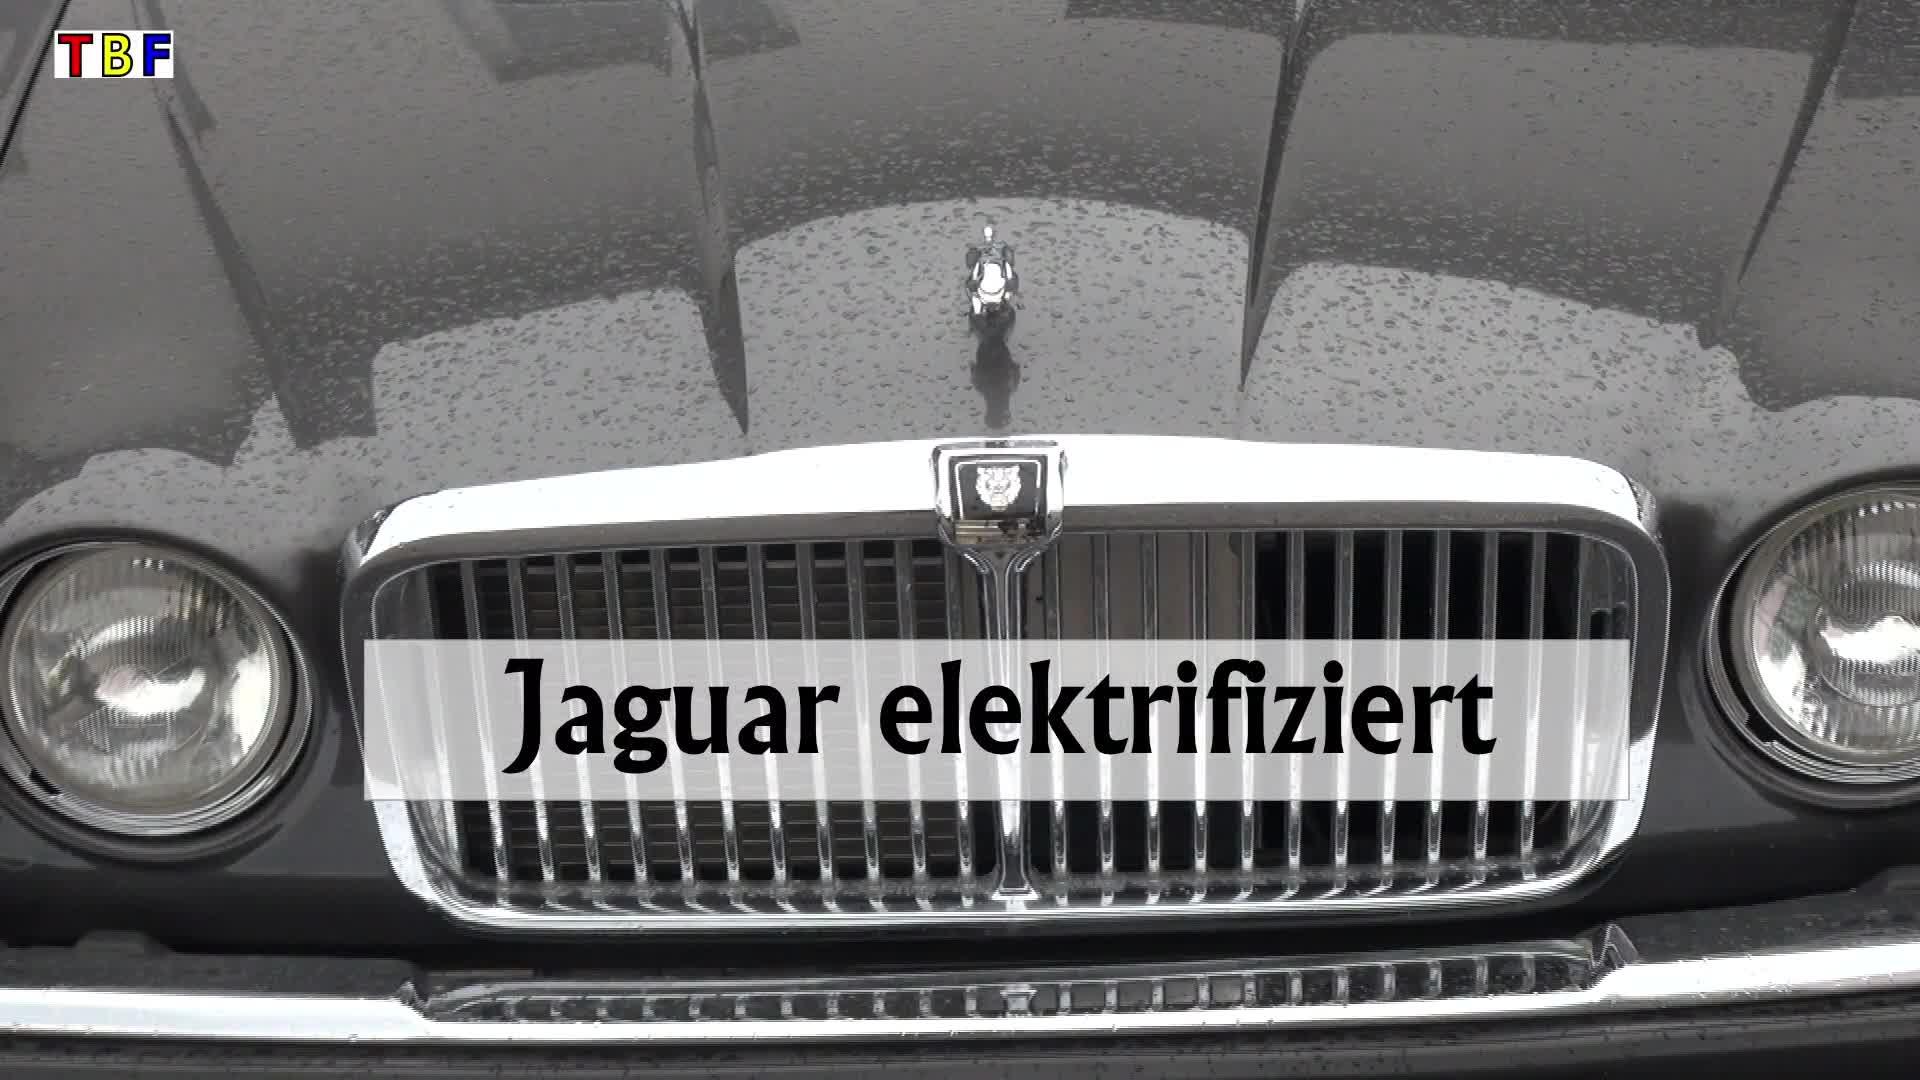 Jaguar elektrifiziert